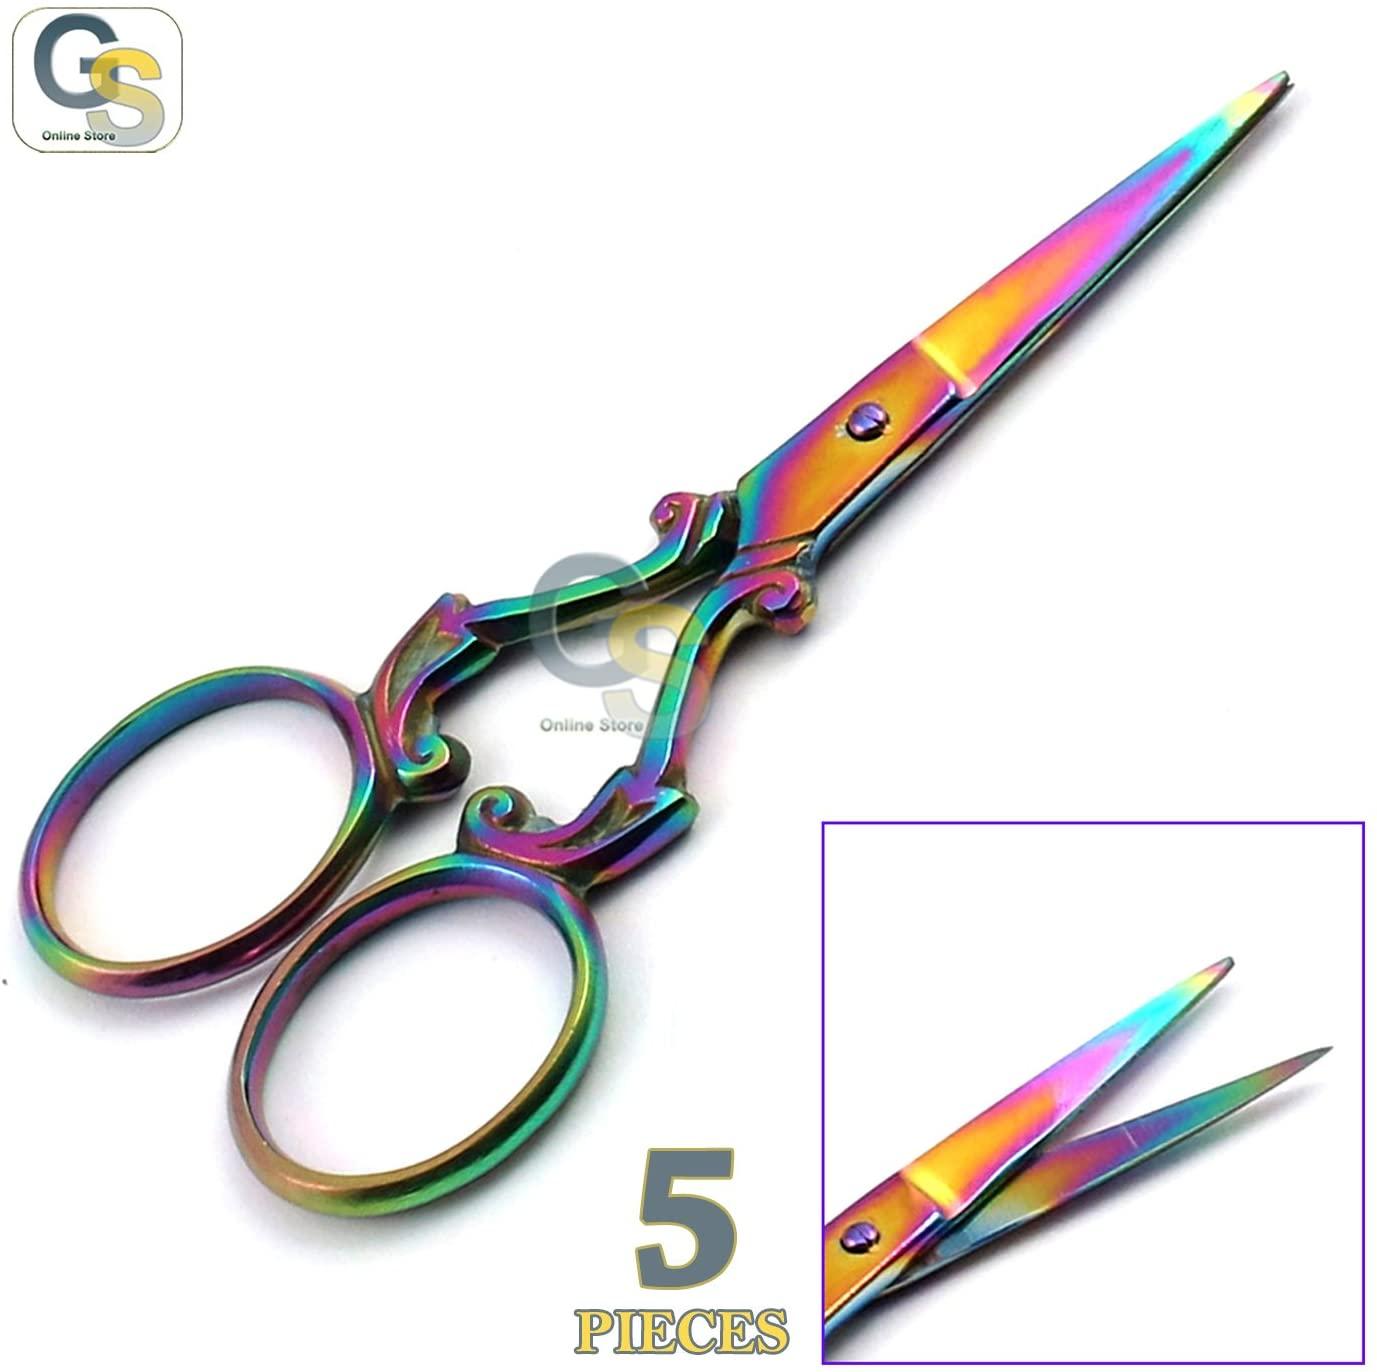 G.S Set of 5 Multi Titanium Color Rainbow Sewing Embroidery Scissors 3.5